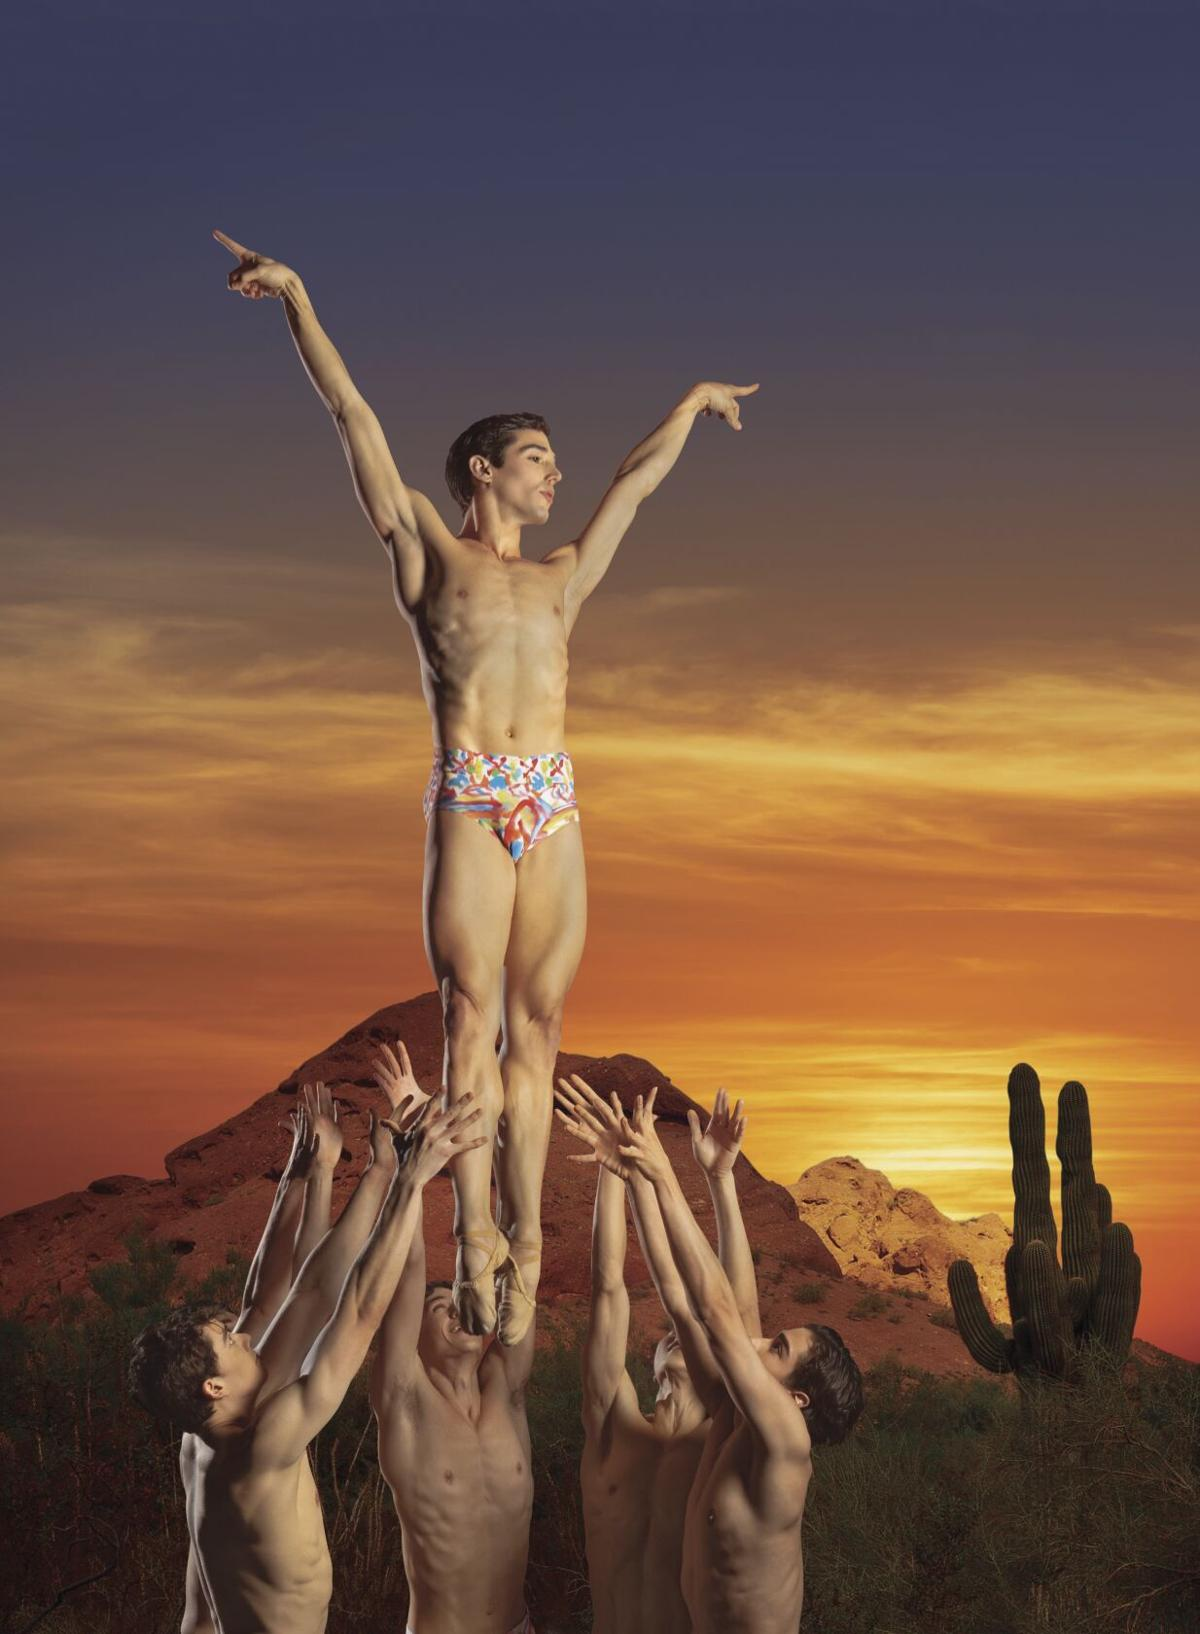 Ballet-Arizona-dancers-in-The-Four-Seasons.-Photo-by-Tim-Fuller.jpg